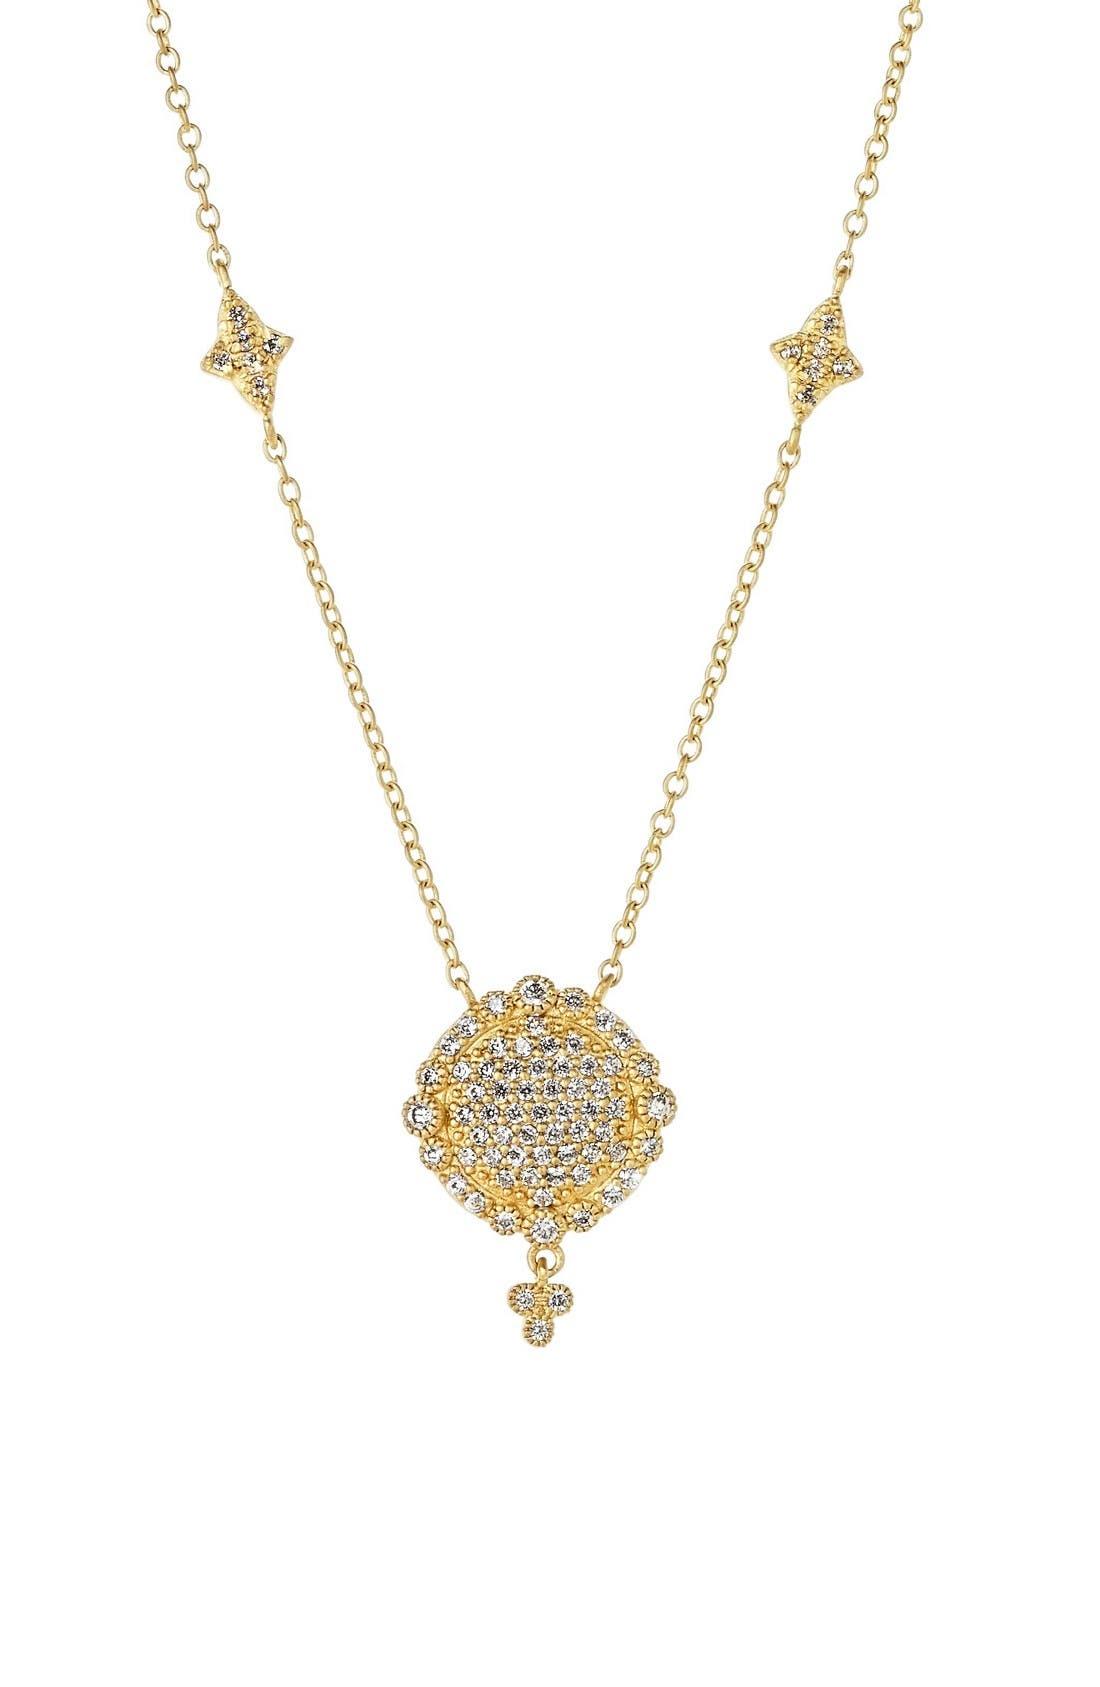 FREIDA ROTHMAN 'Mercer' Pavé Pendant Necklace